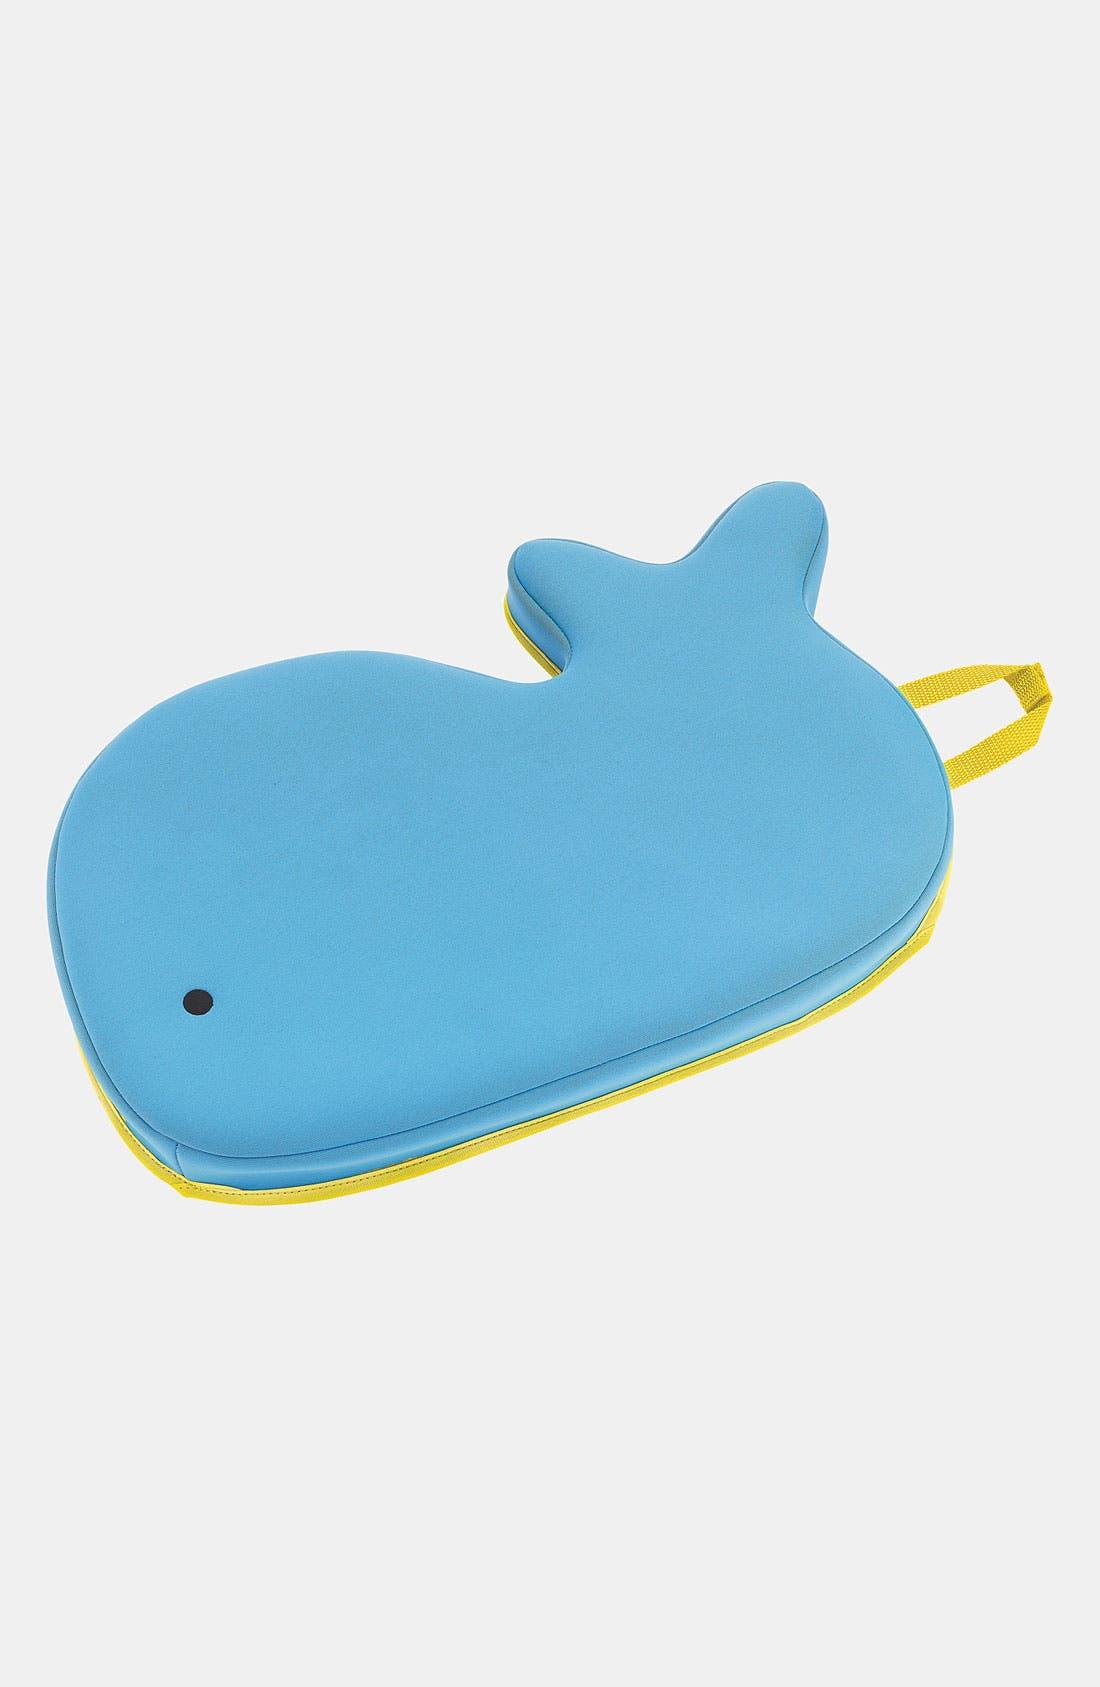 'Moby' Bath Kneeler,                             Main thumbnail 1, color,                             BLUE W/ YELLOW TRIM